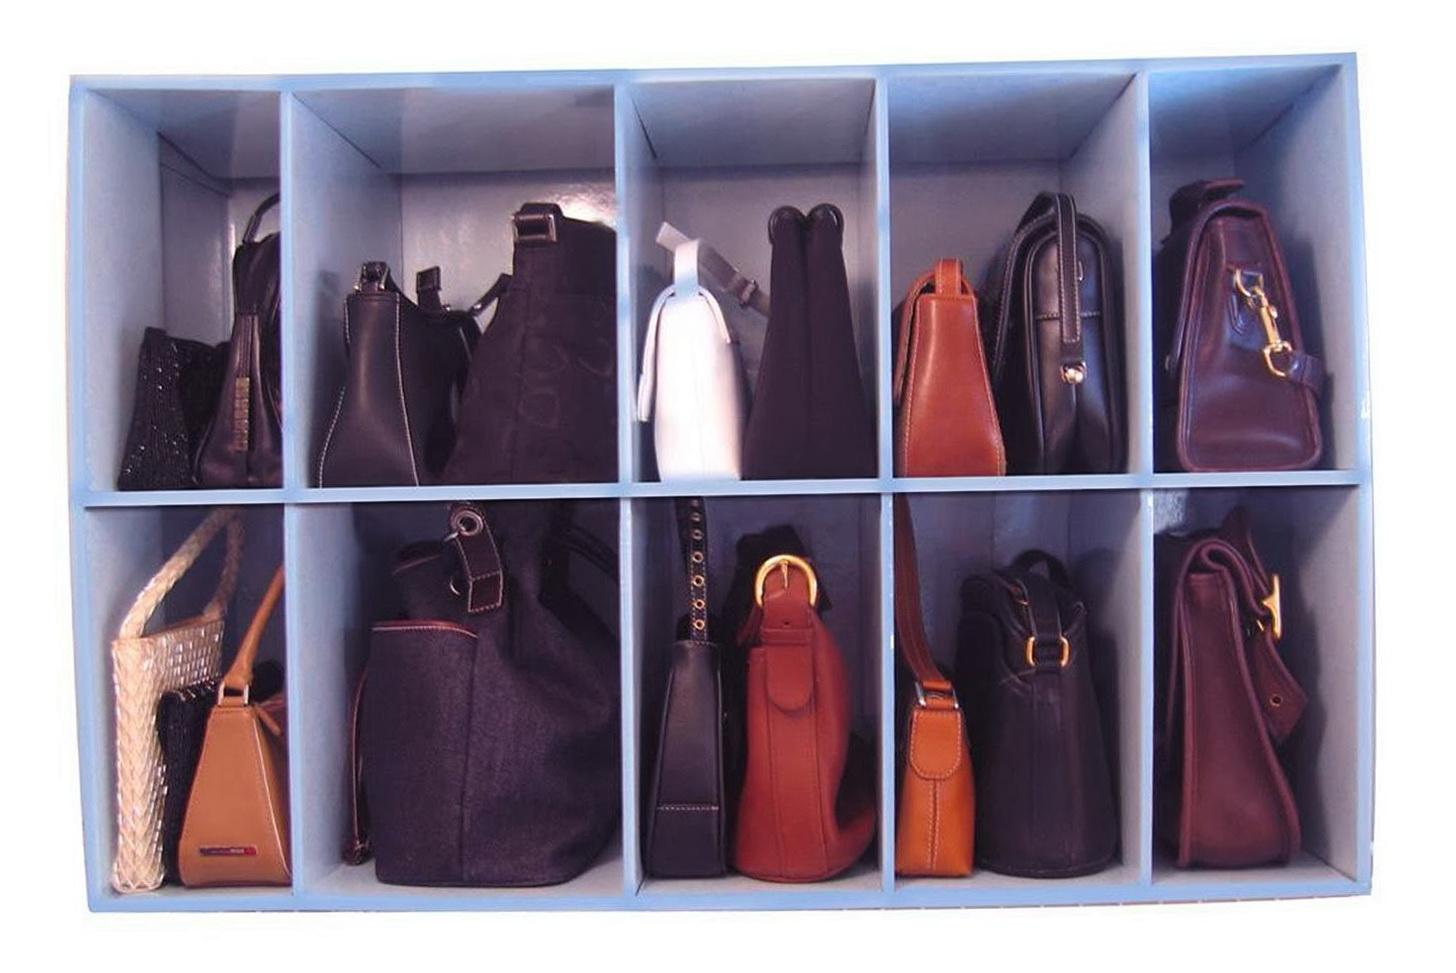 Organizing Purses In Your Closet